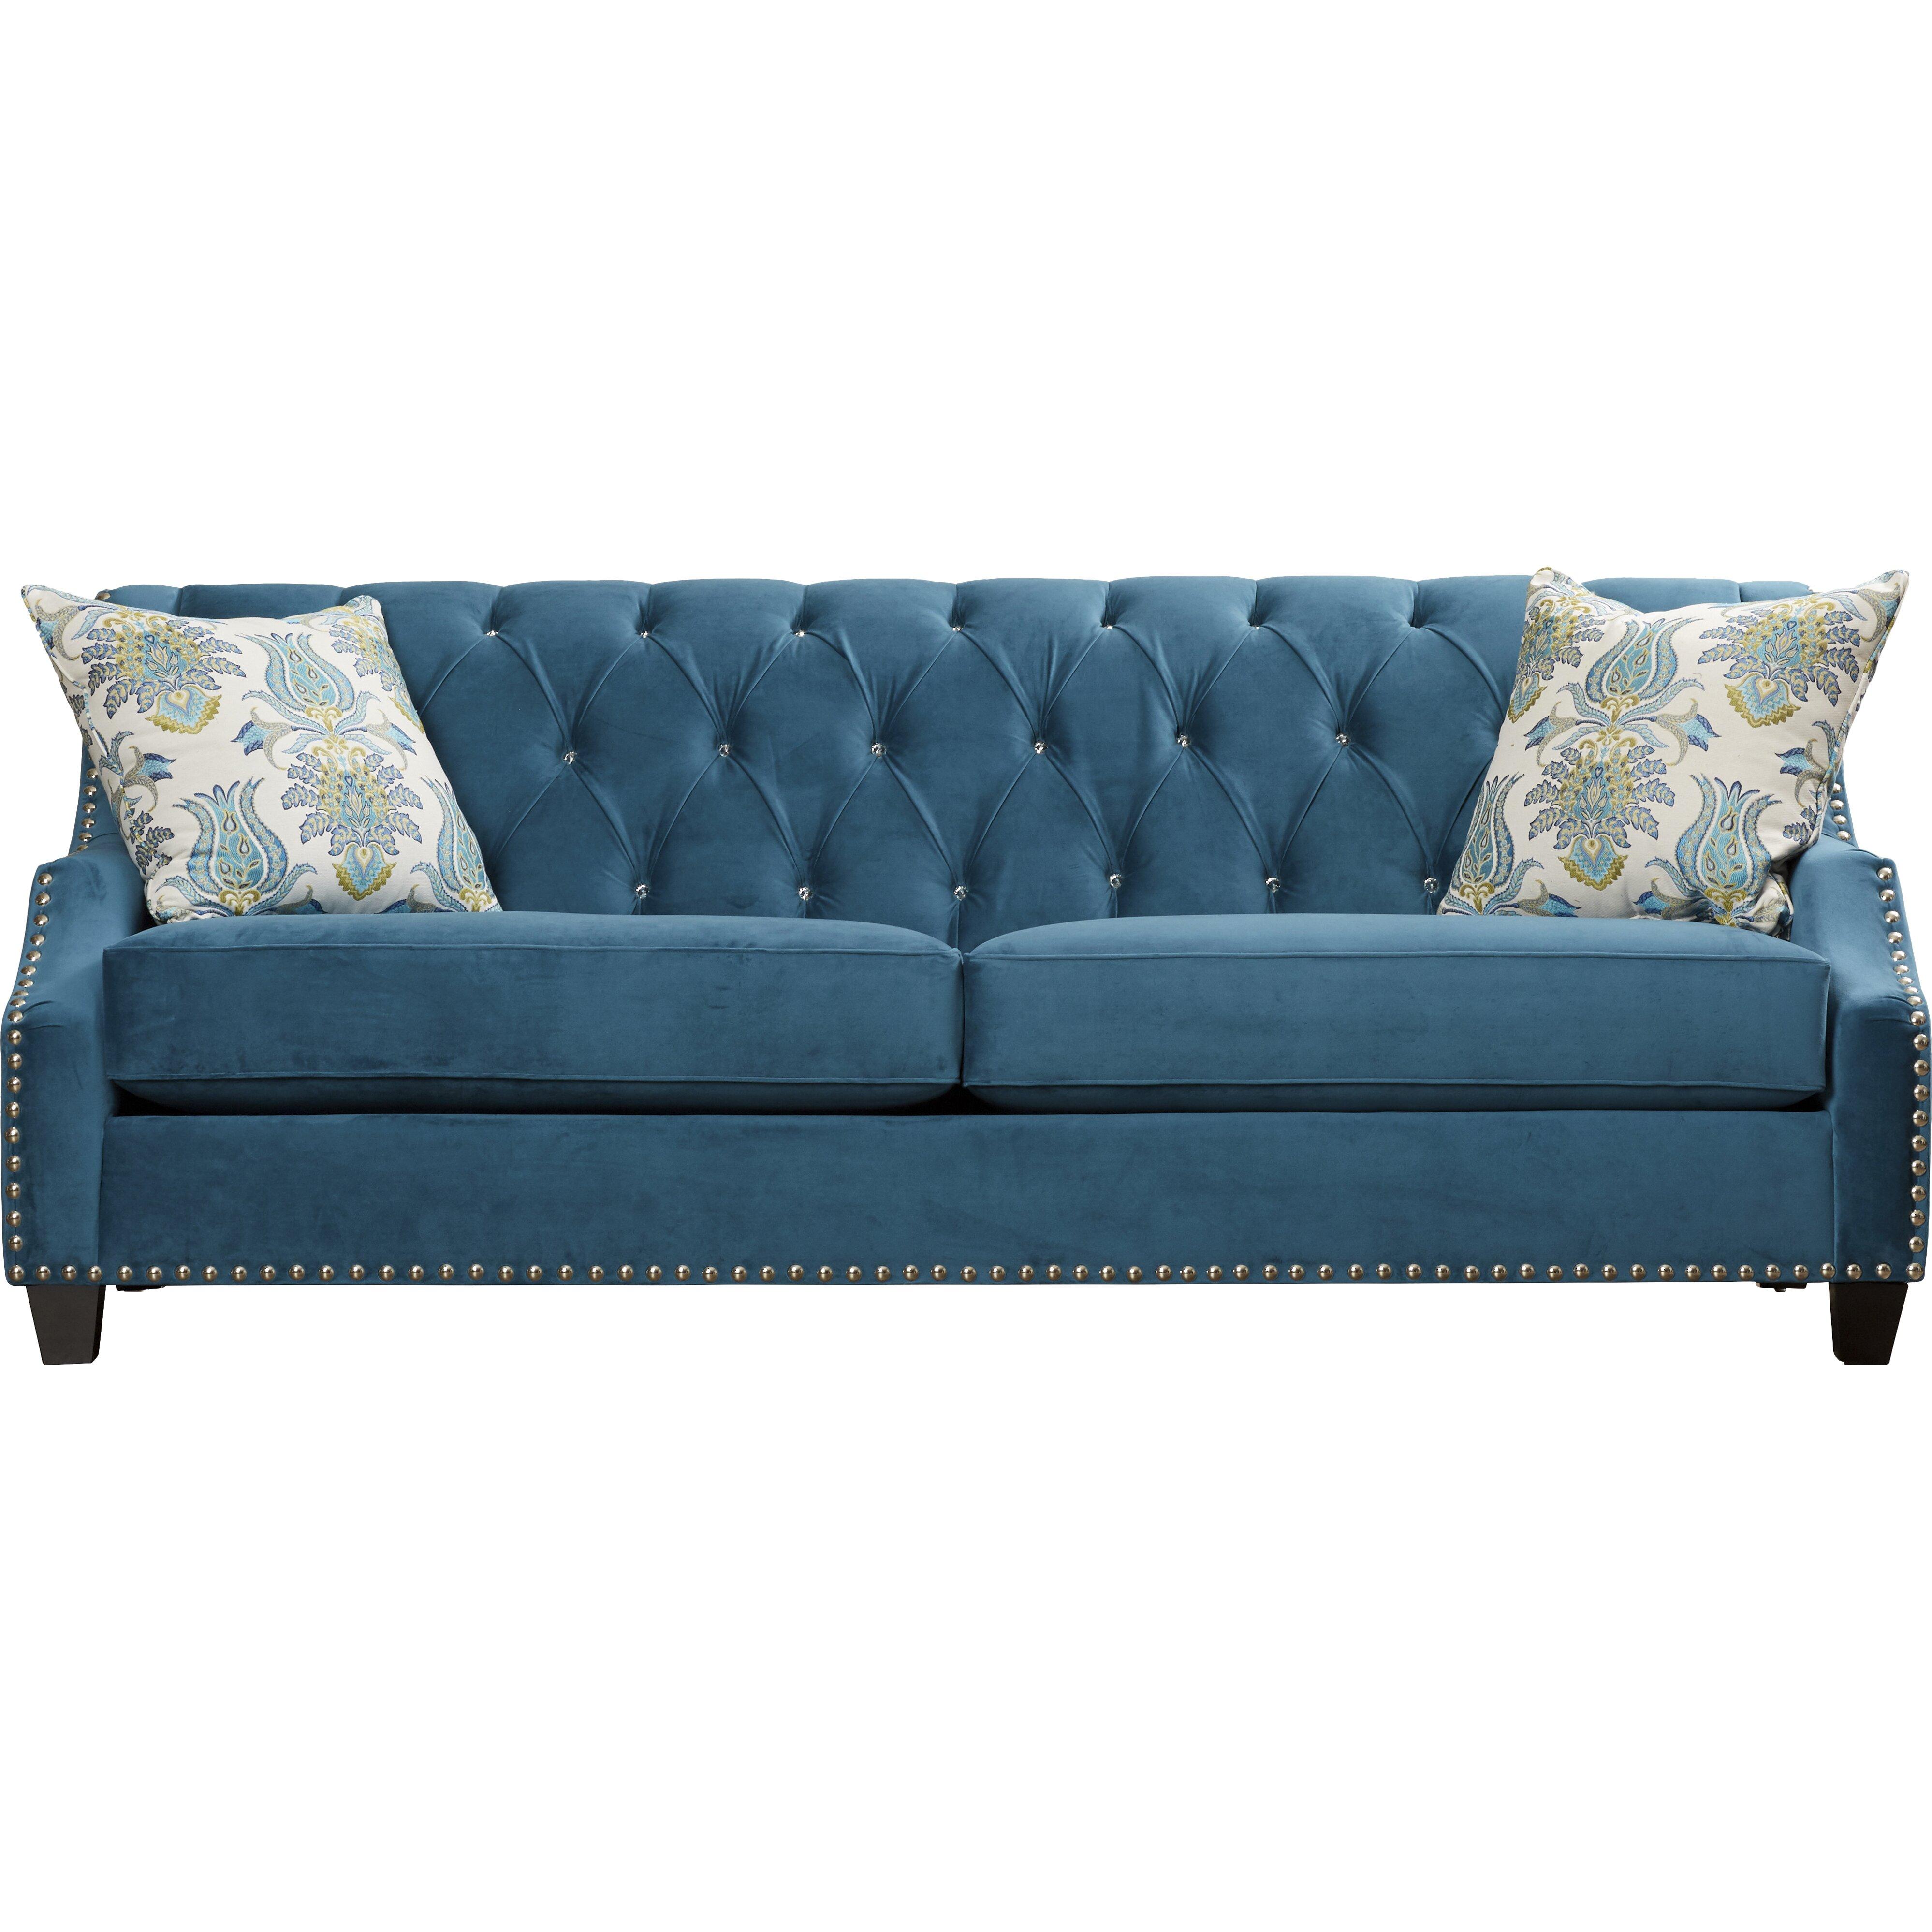 House of hampton erion sofa reviews wayfair for House of hampton bedding